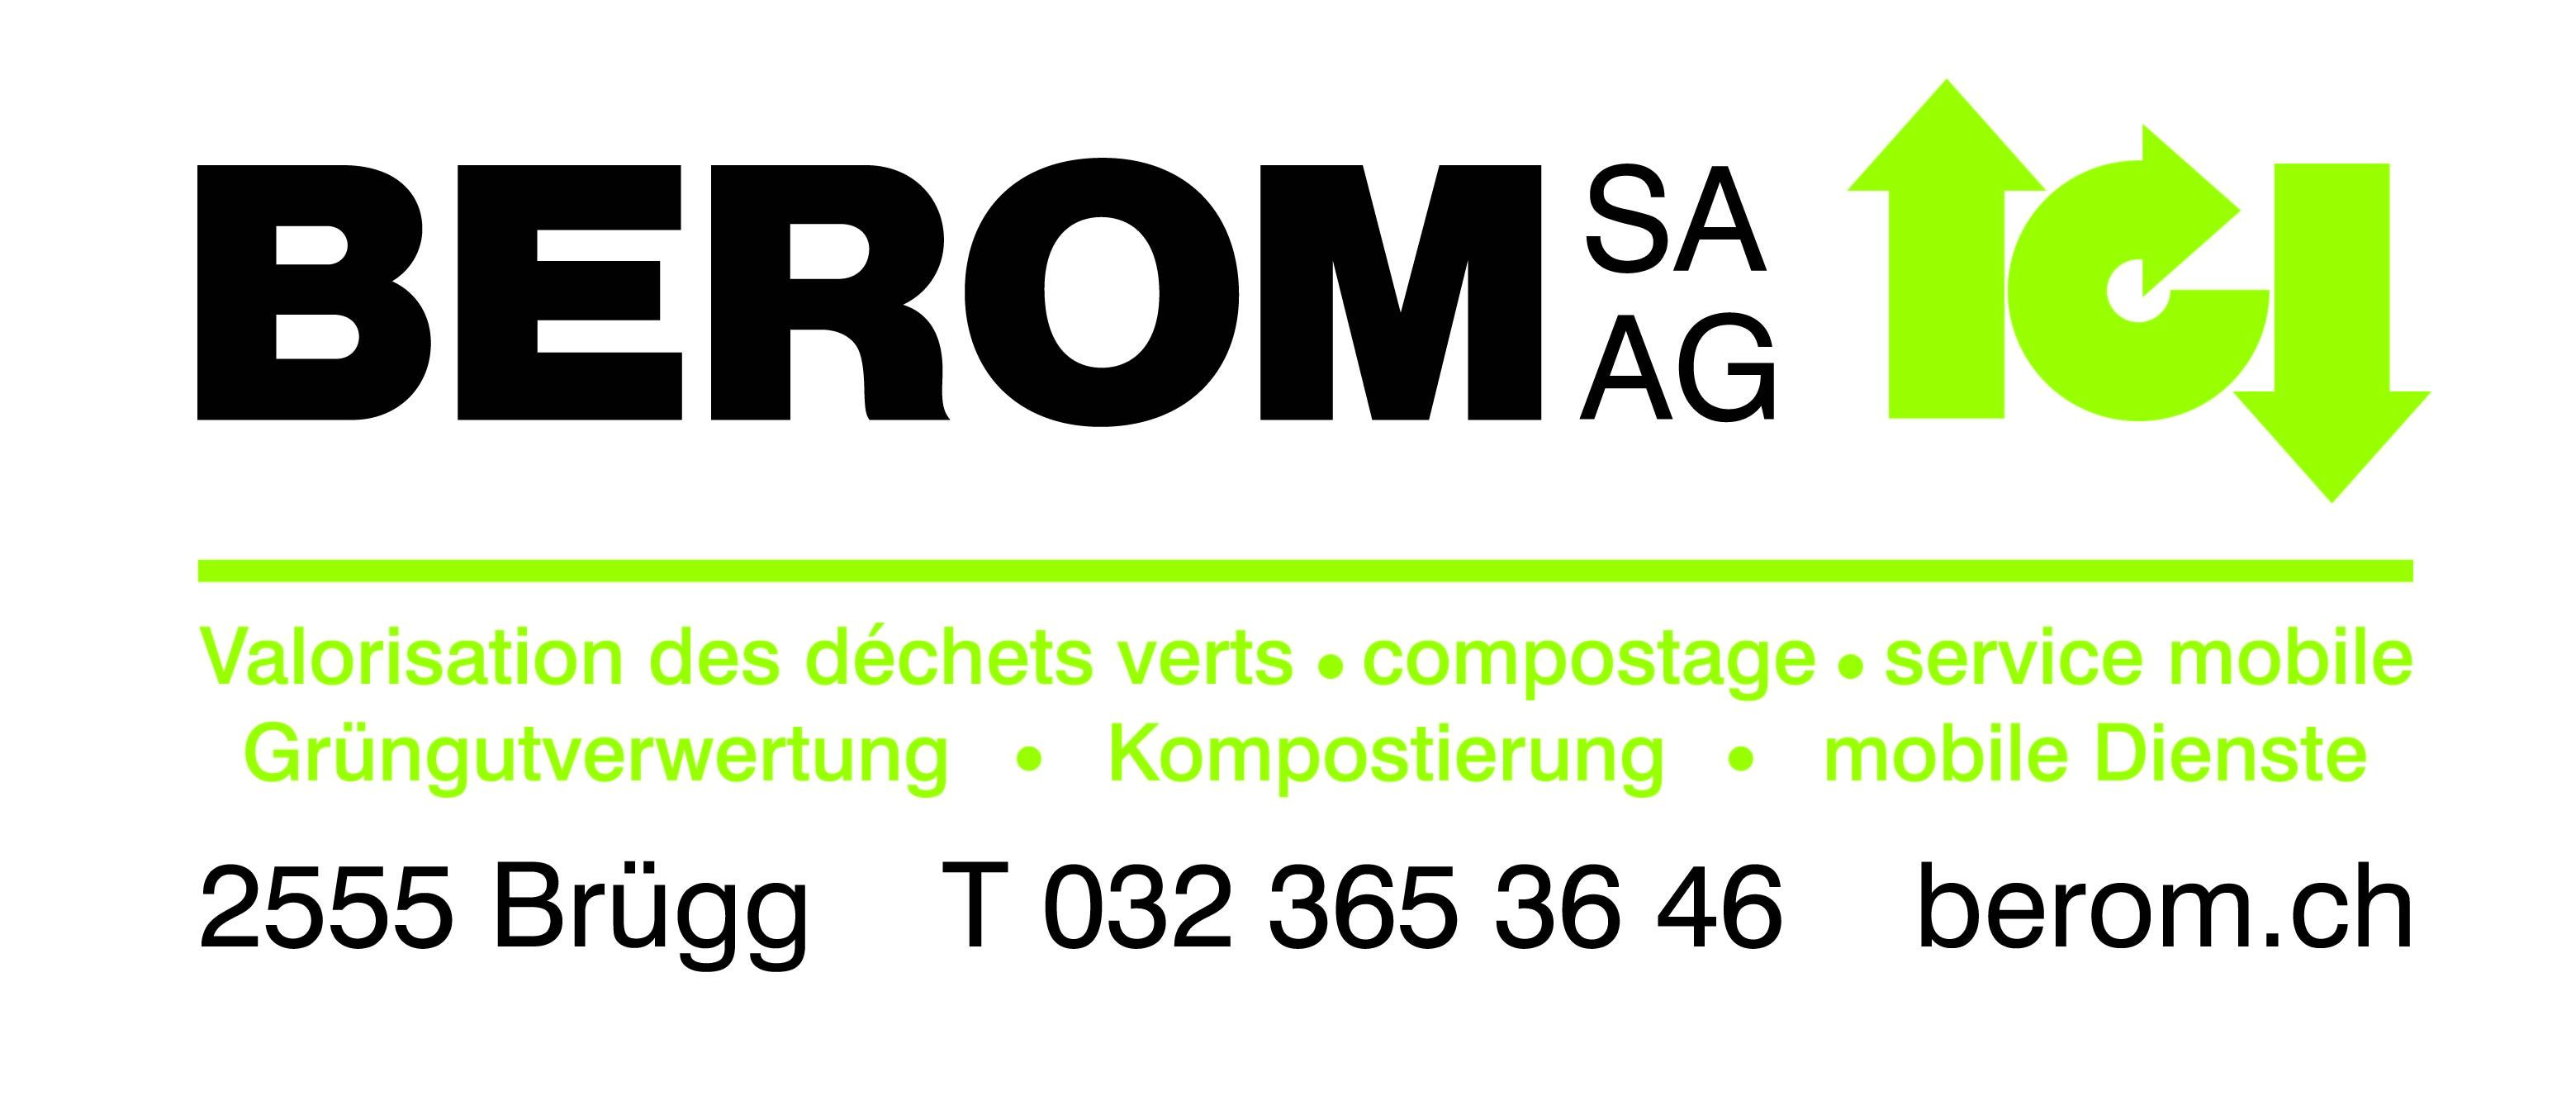 Berom AG, Brügg